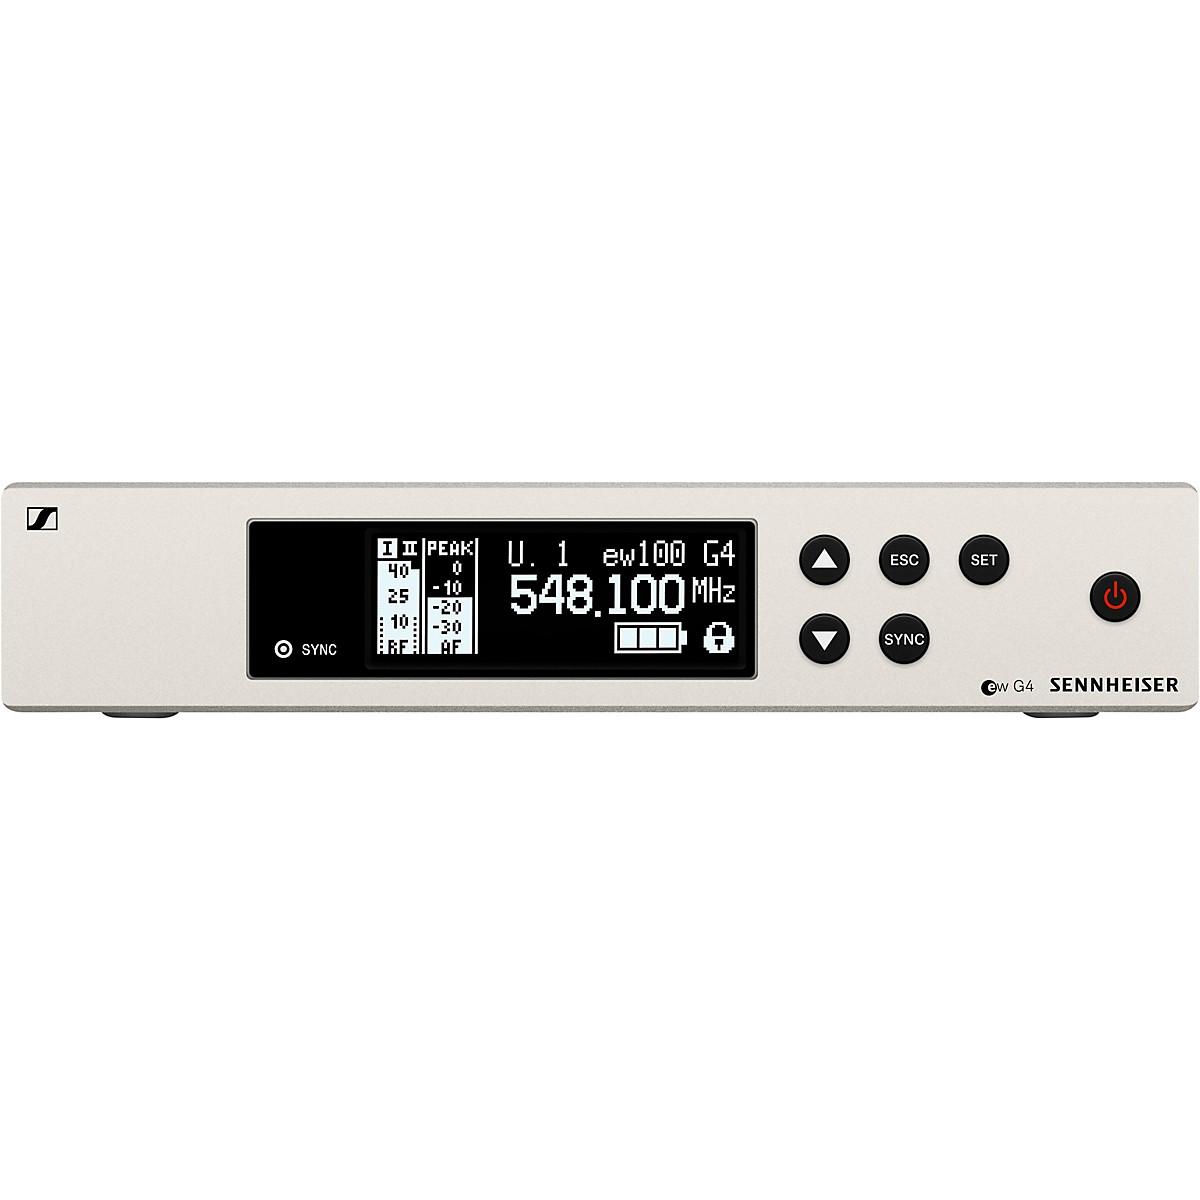 Sennheiser EM 100 G4 Wireless Receiver